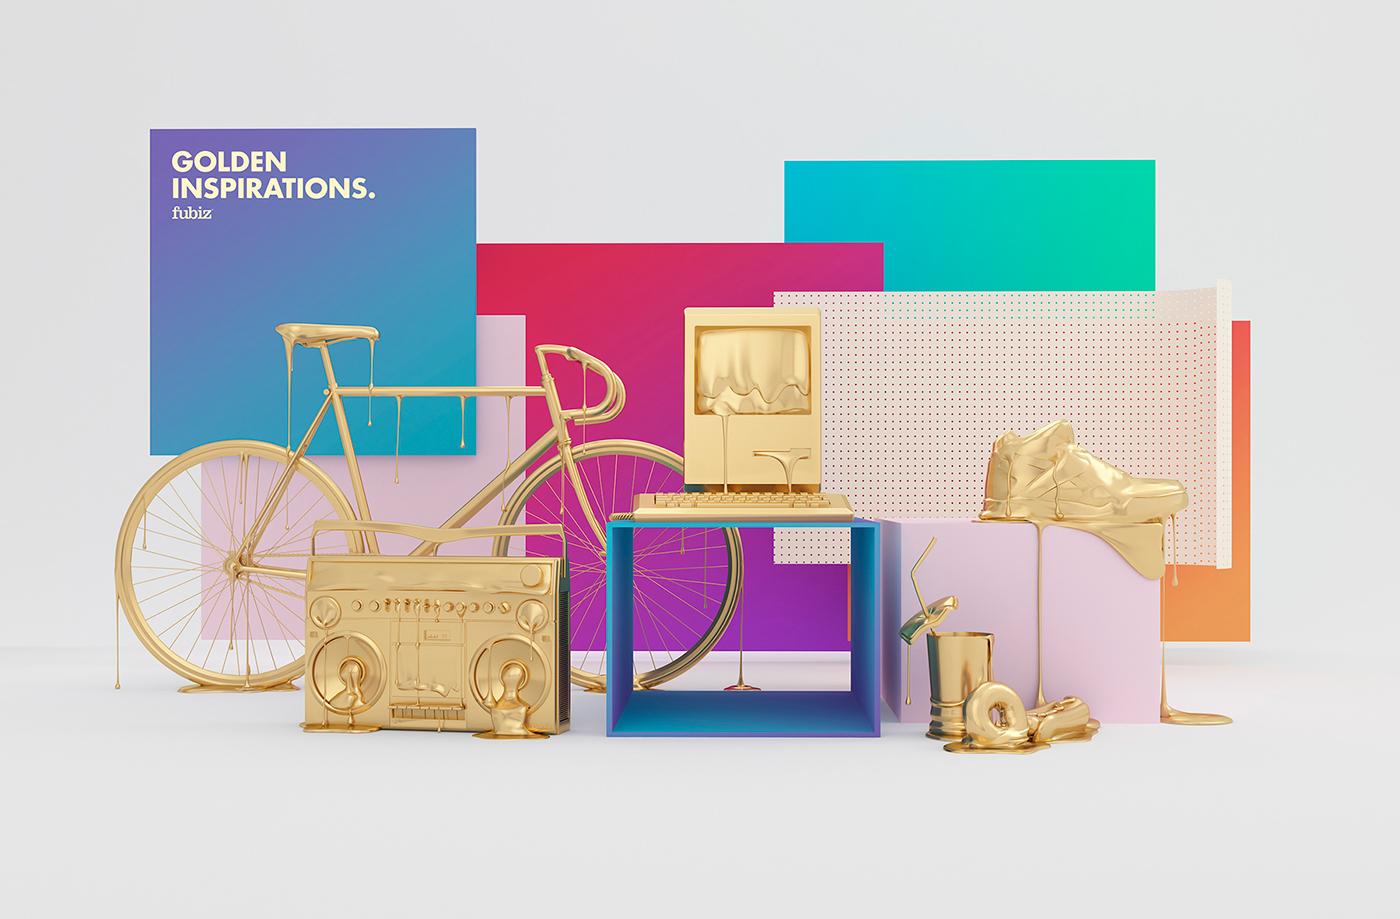 GOLDEN INSPIRATIONS 广告设计 – 国外广告设计案例精选